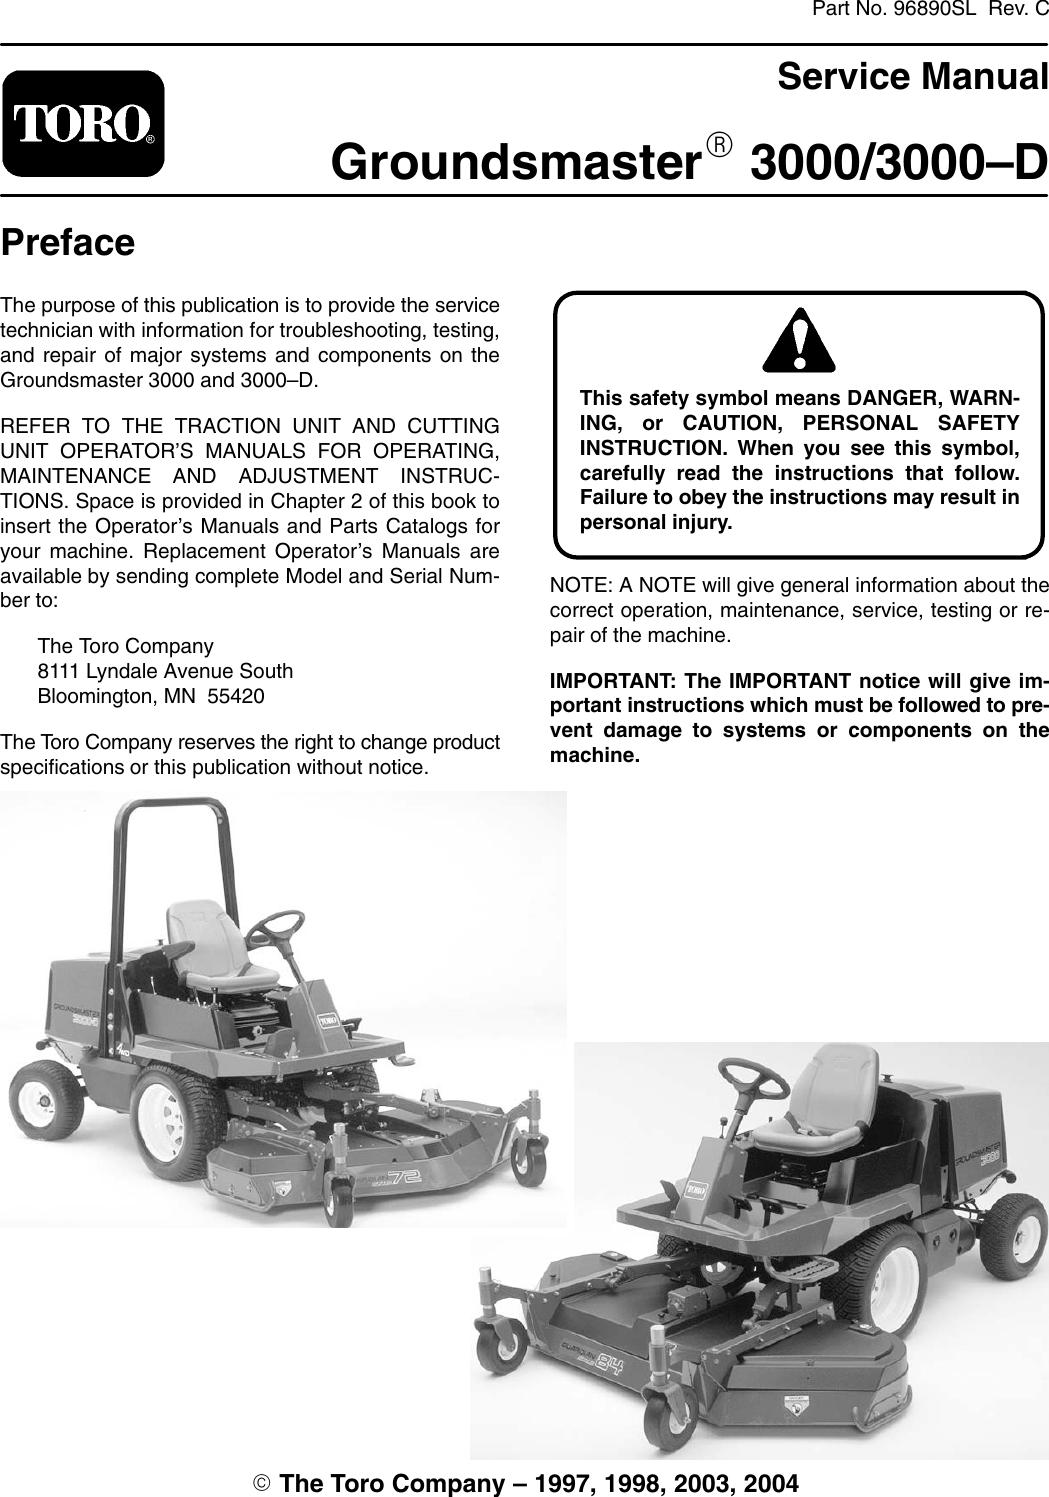 Toro Groundsmaster 3000 D Factory Service Work Shop Manual